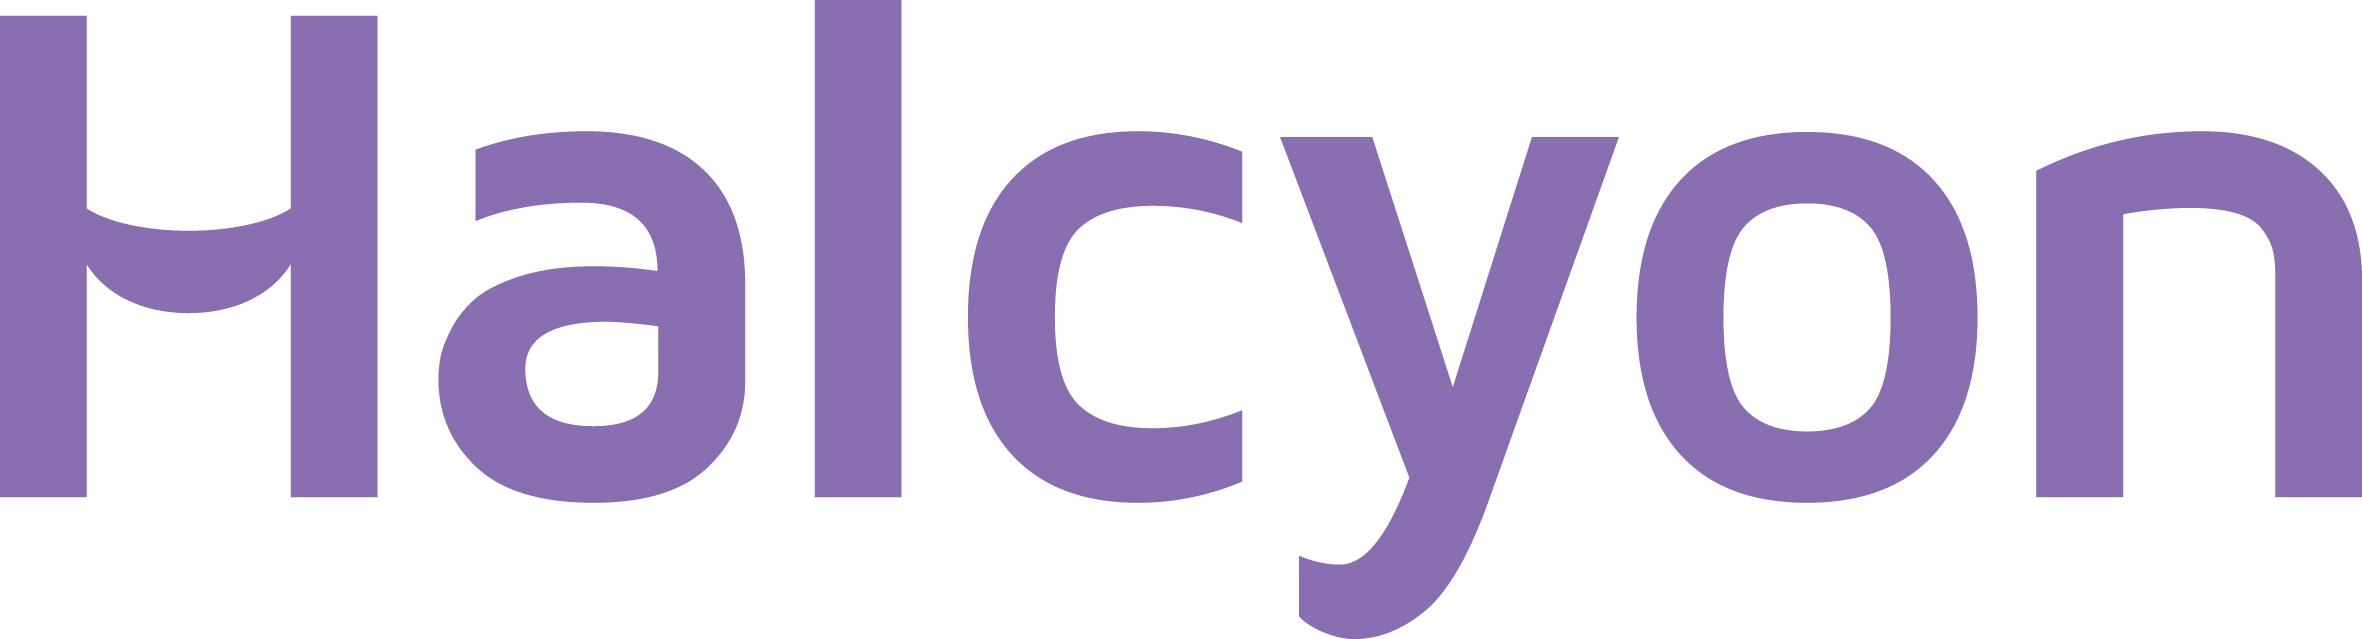 Halcyon Promotional Merchandise